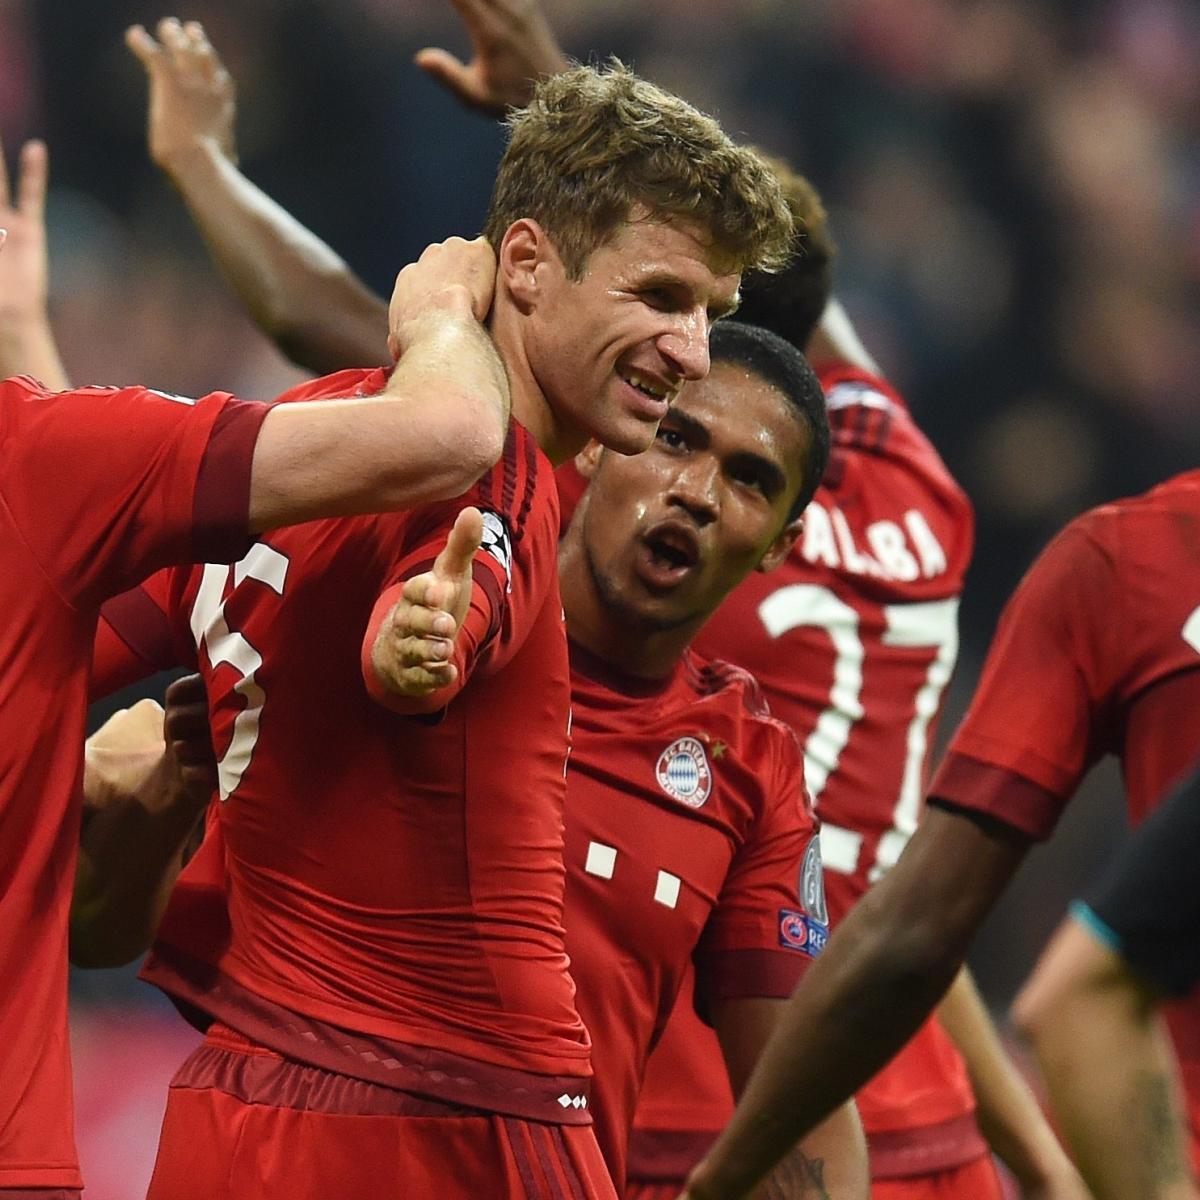 Arsenal Vs Barcelona Live Score Highlights From: Bayern Munich Vs. Arsenal: Live Score, Highlights From